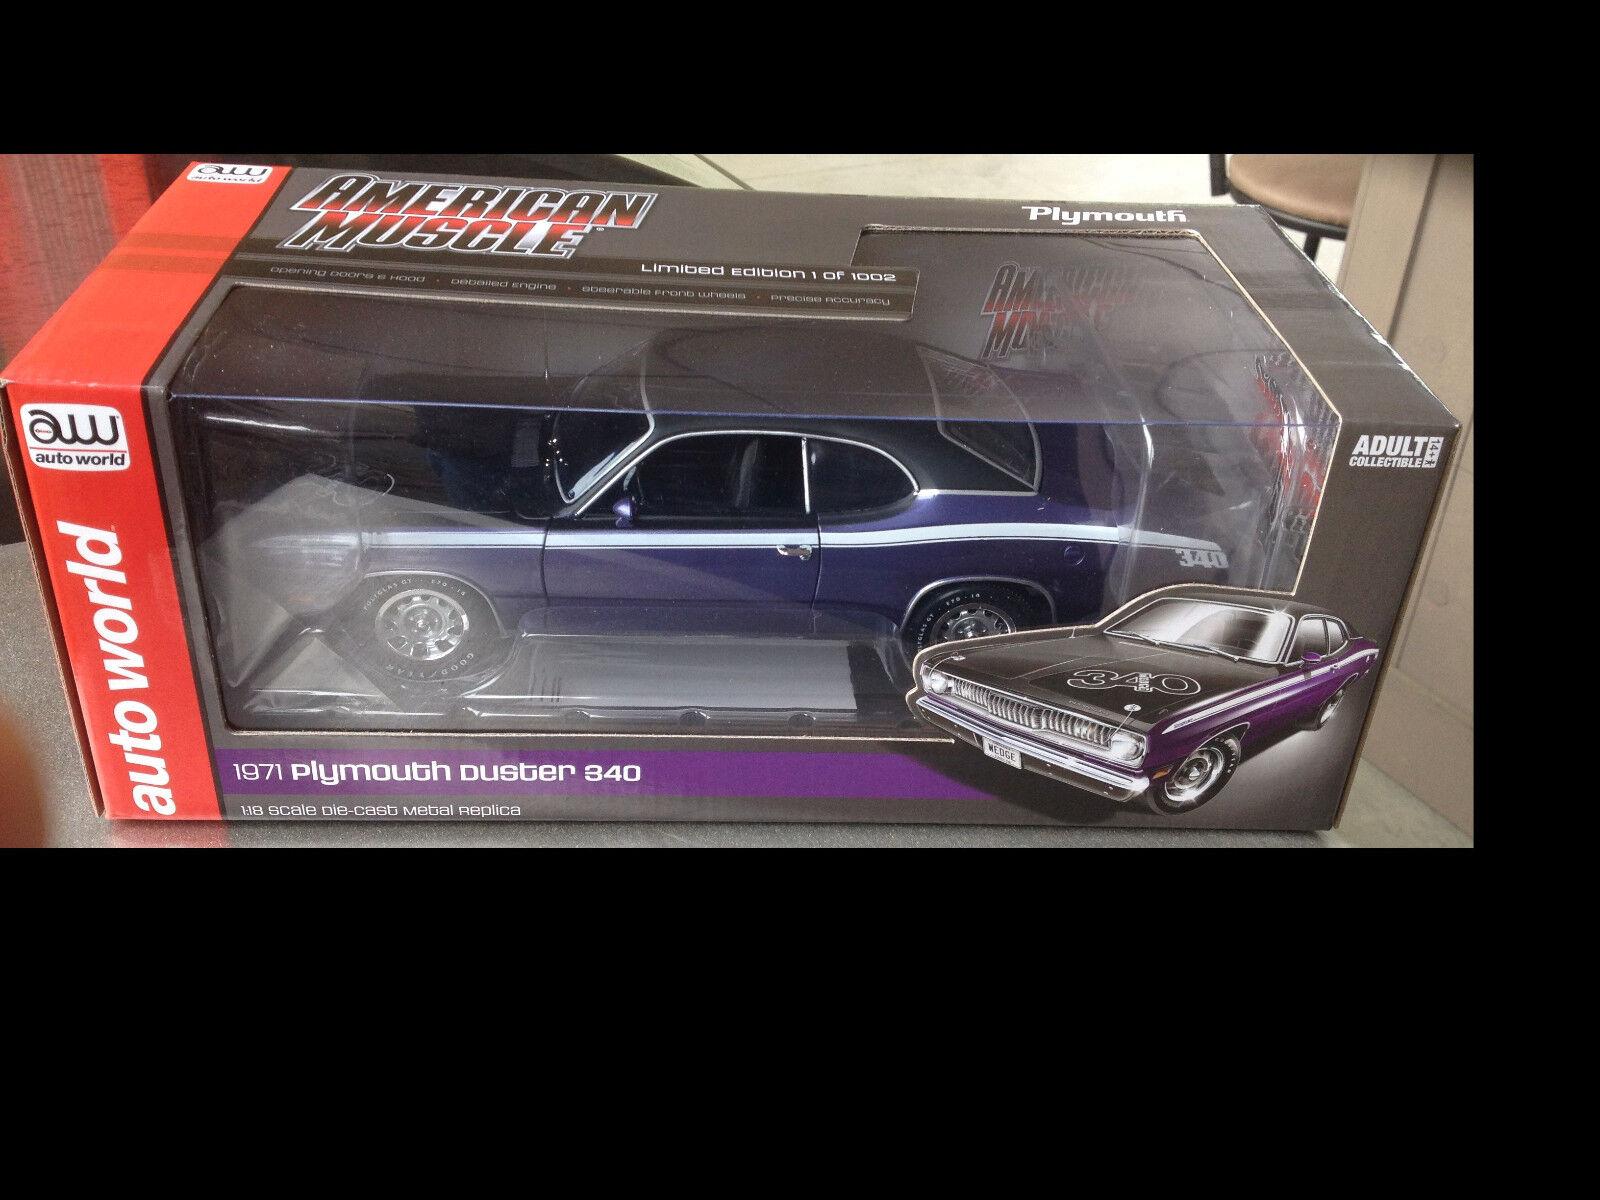 buscando agente de ventas 1971 Plymouth Duster de 340 340 340 inpúrpura 1 18 Autoworld 1052  directo de fábrica